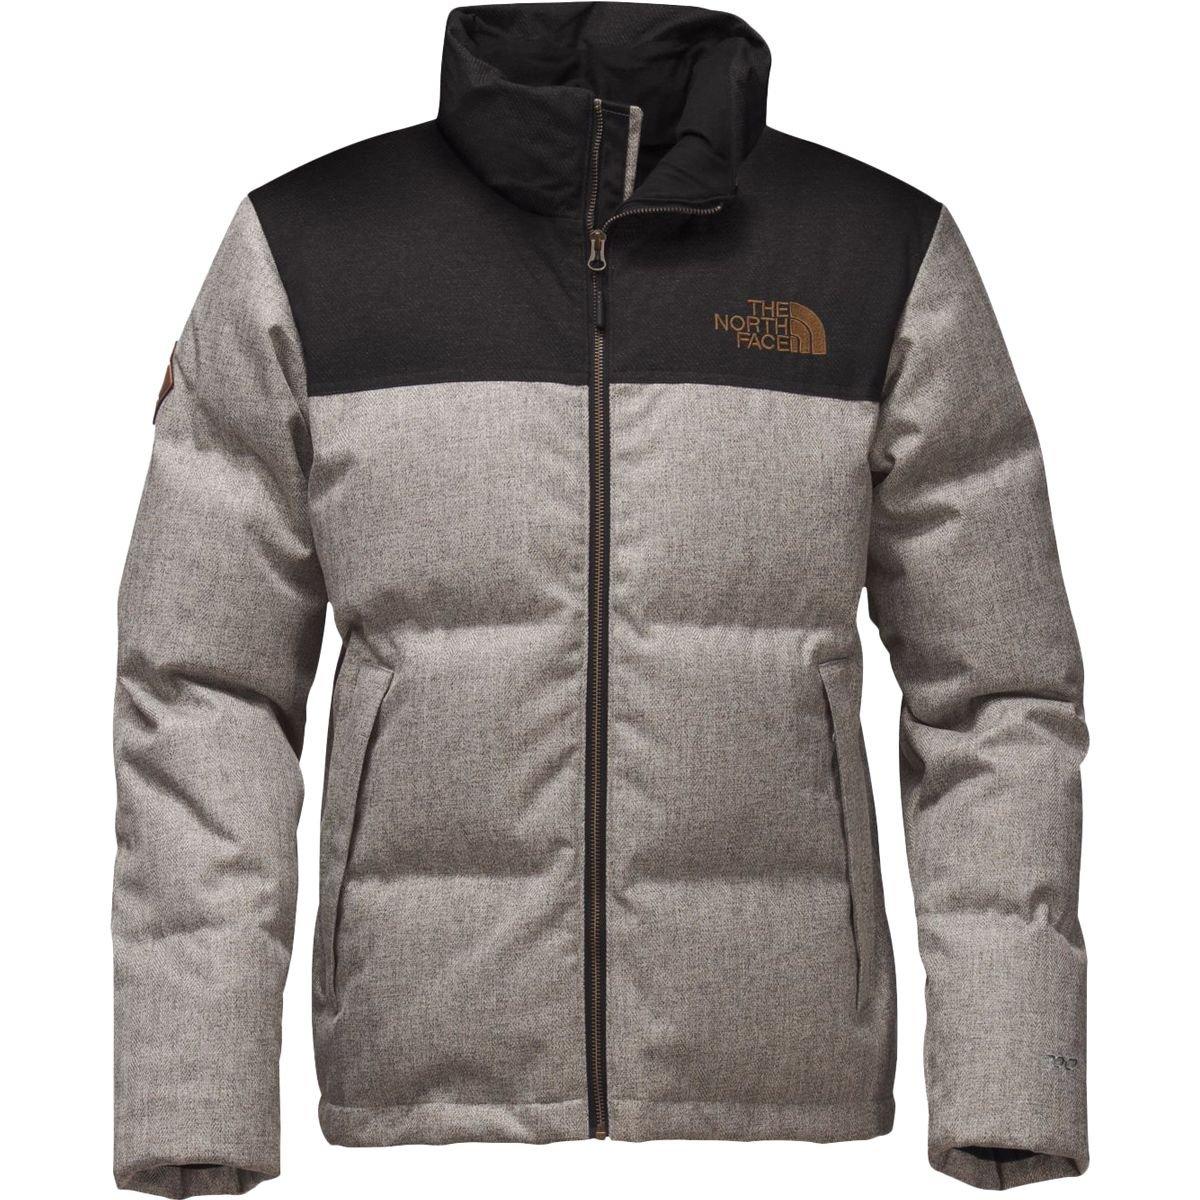 9c1b6a64d2 Amazon.com  The North Face Men s Novelty Nuptse Jacket Monument Grey  Herringbone Tnf Black Dobby Large  Sports   Outdoors